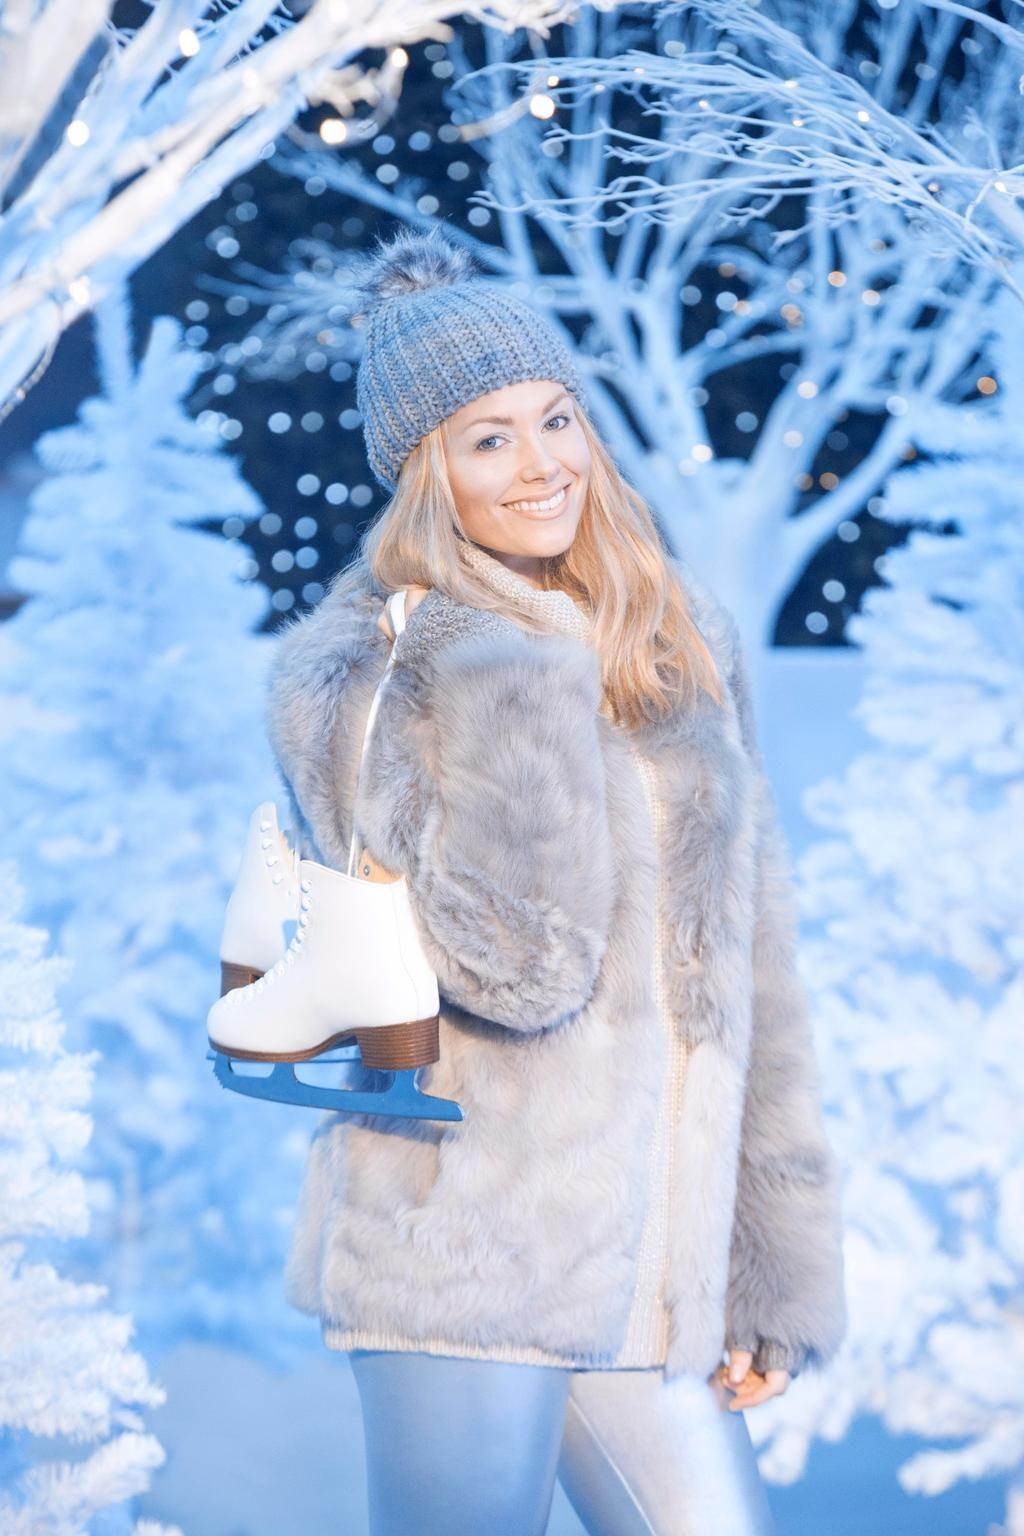 The stunning @GeorgiaHorsley1 launches Yorkshire's Winter Wonderland at #YorkOutlet #SkatePlayShopDine